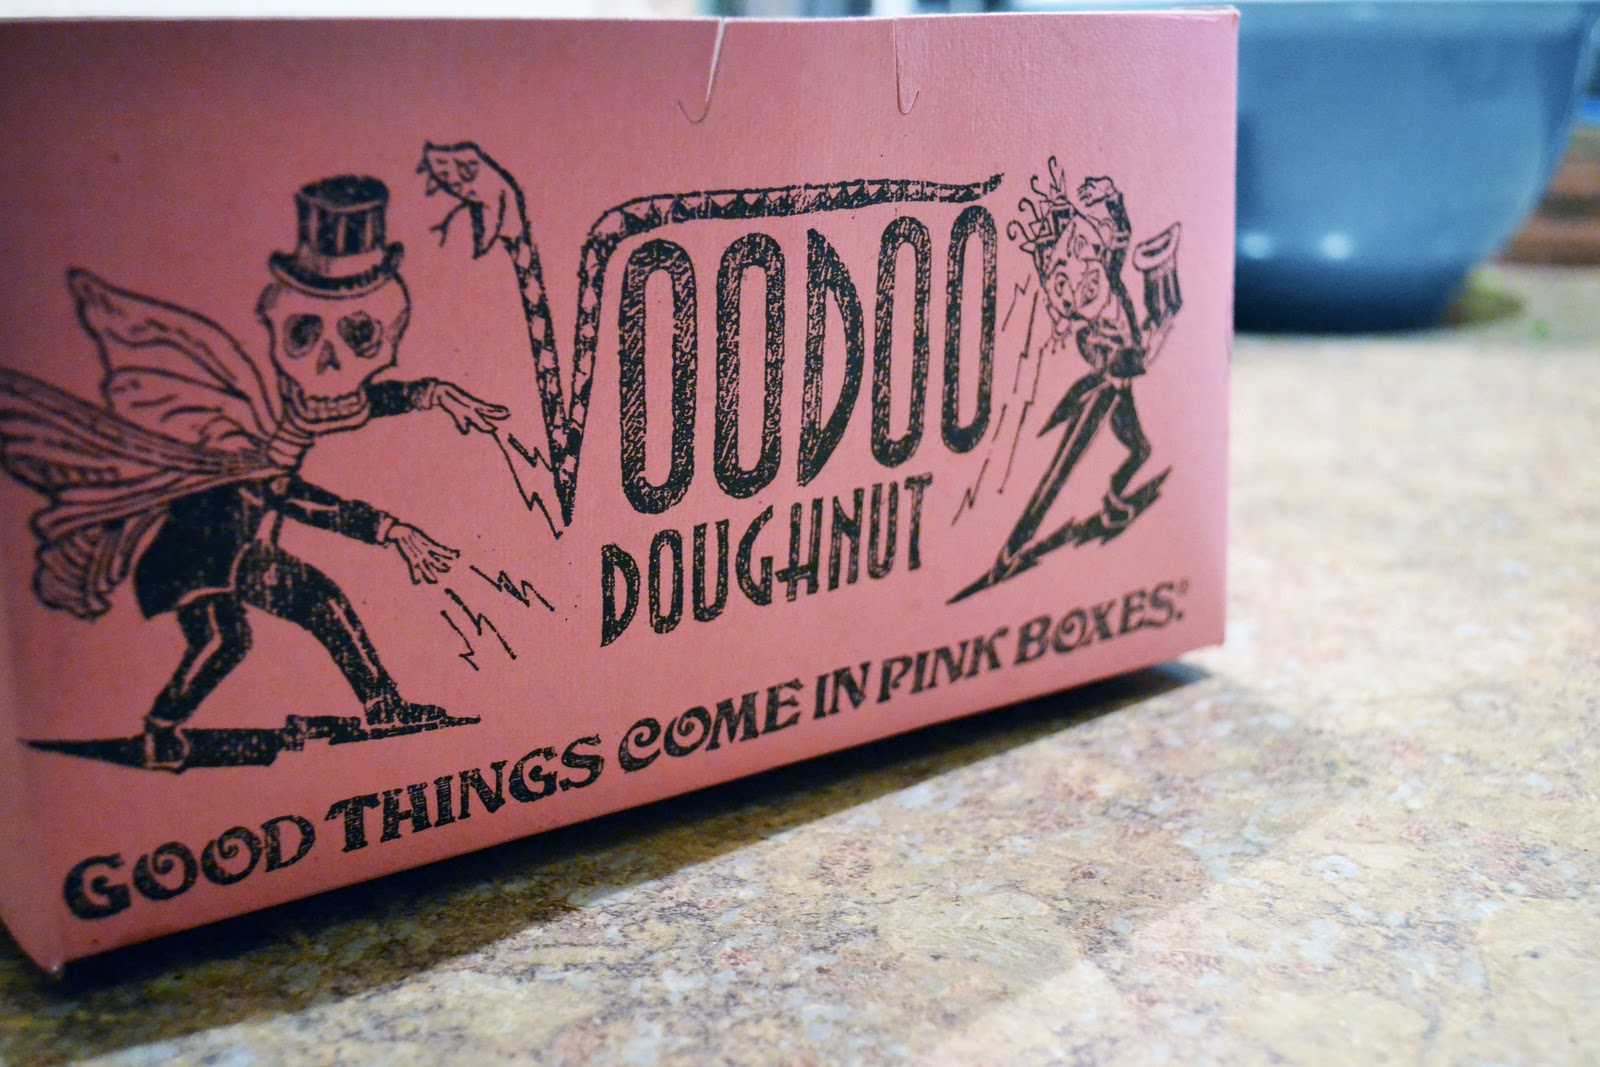 http://1.bp.blogspot.com/_-uuFHtKZ9Pg/TRkOaps3LGI/AAAAAAAACsc/xeuN6HR4u_8/s1600/voodoo+donuts.jpg